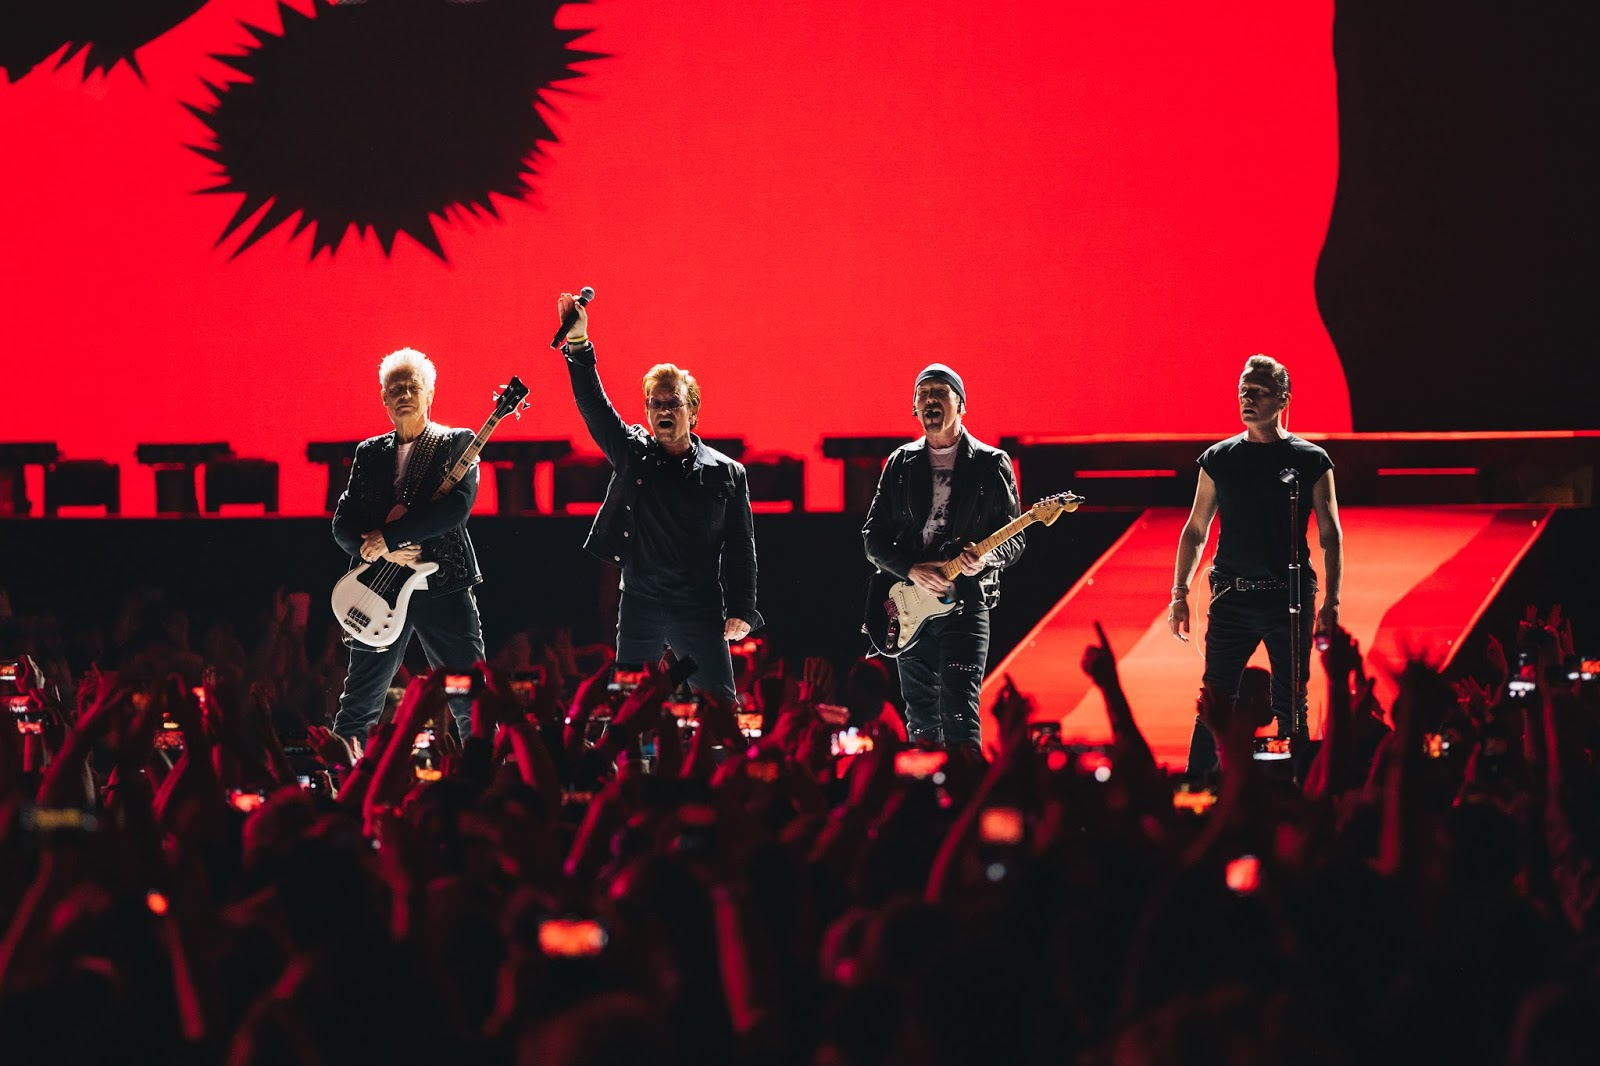 Rock 'n' Roll Truth: U2 eXPERIENCE + iNNOCENCE TOUR 2018